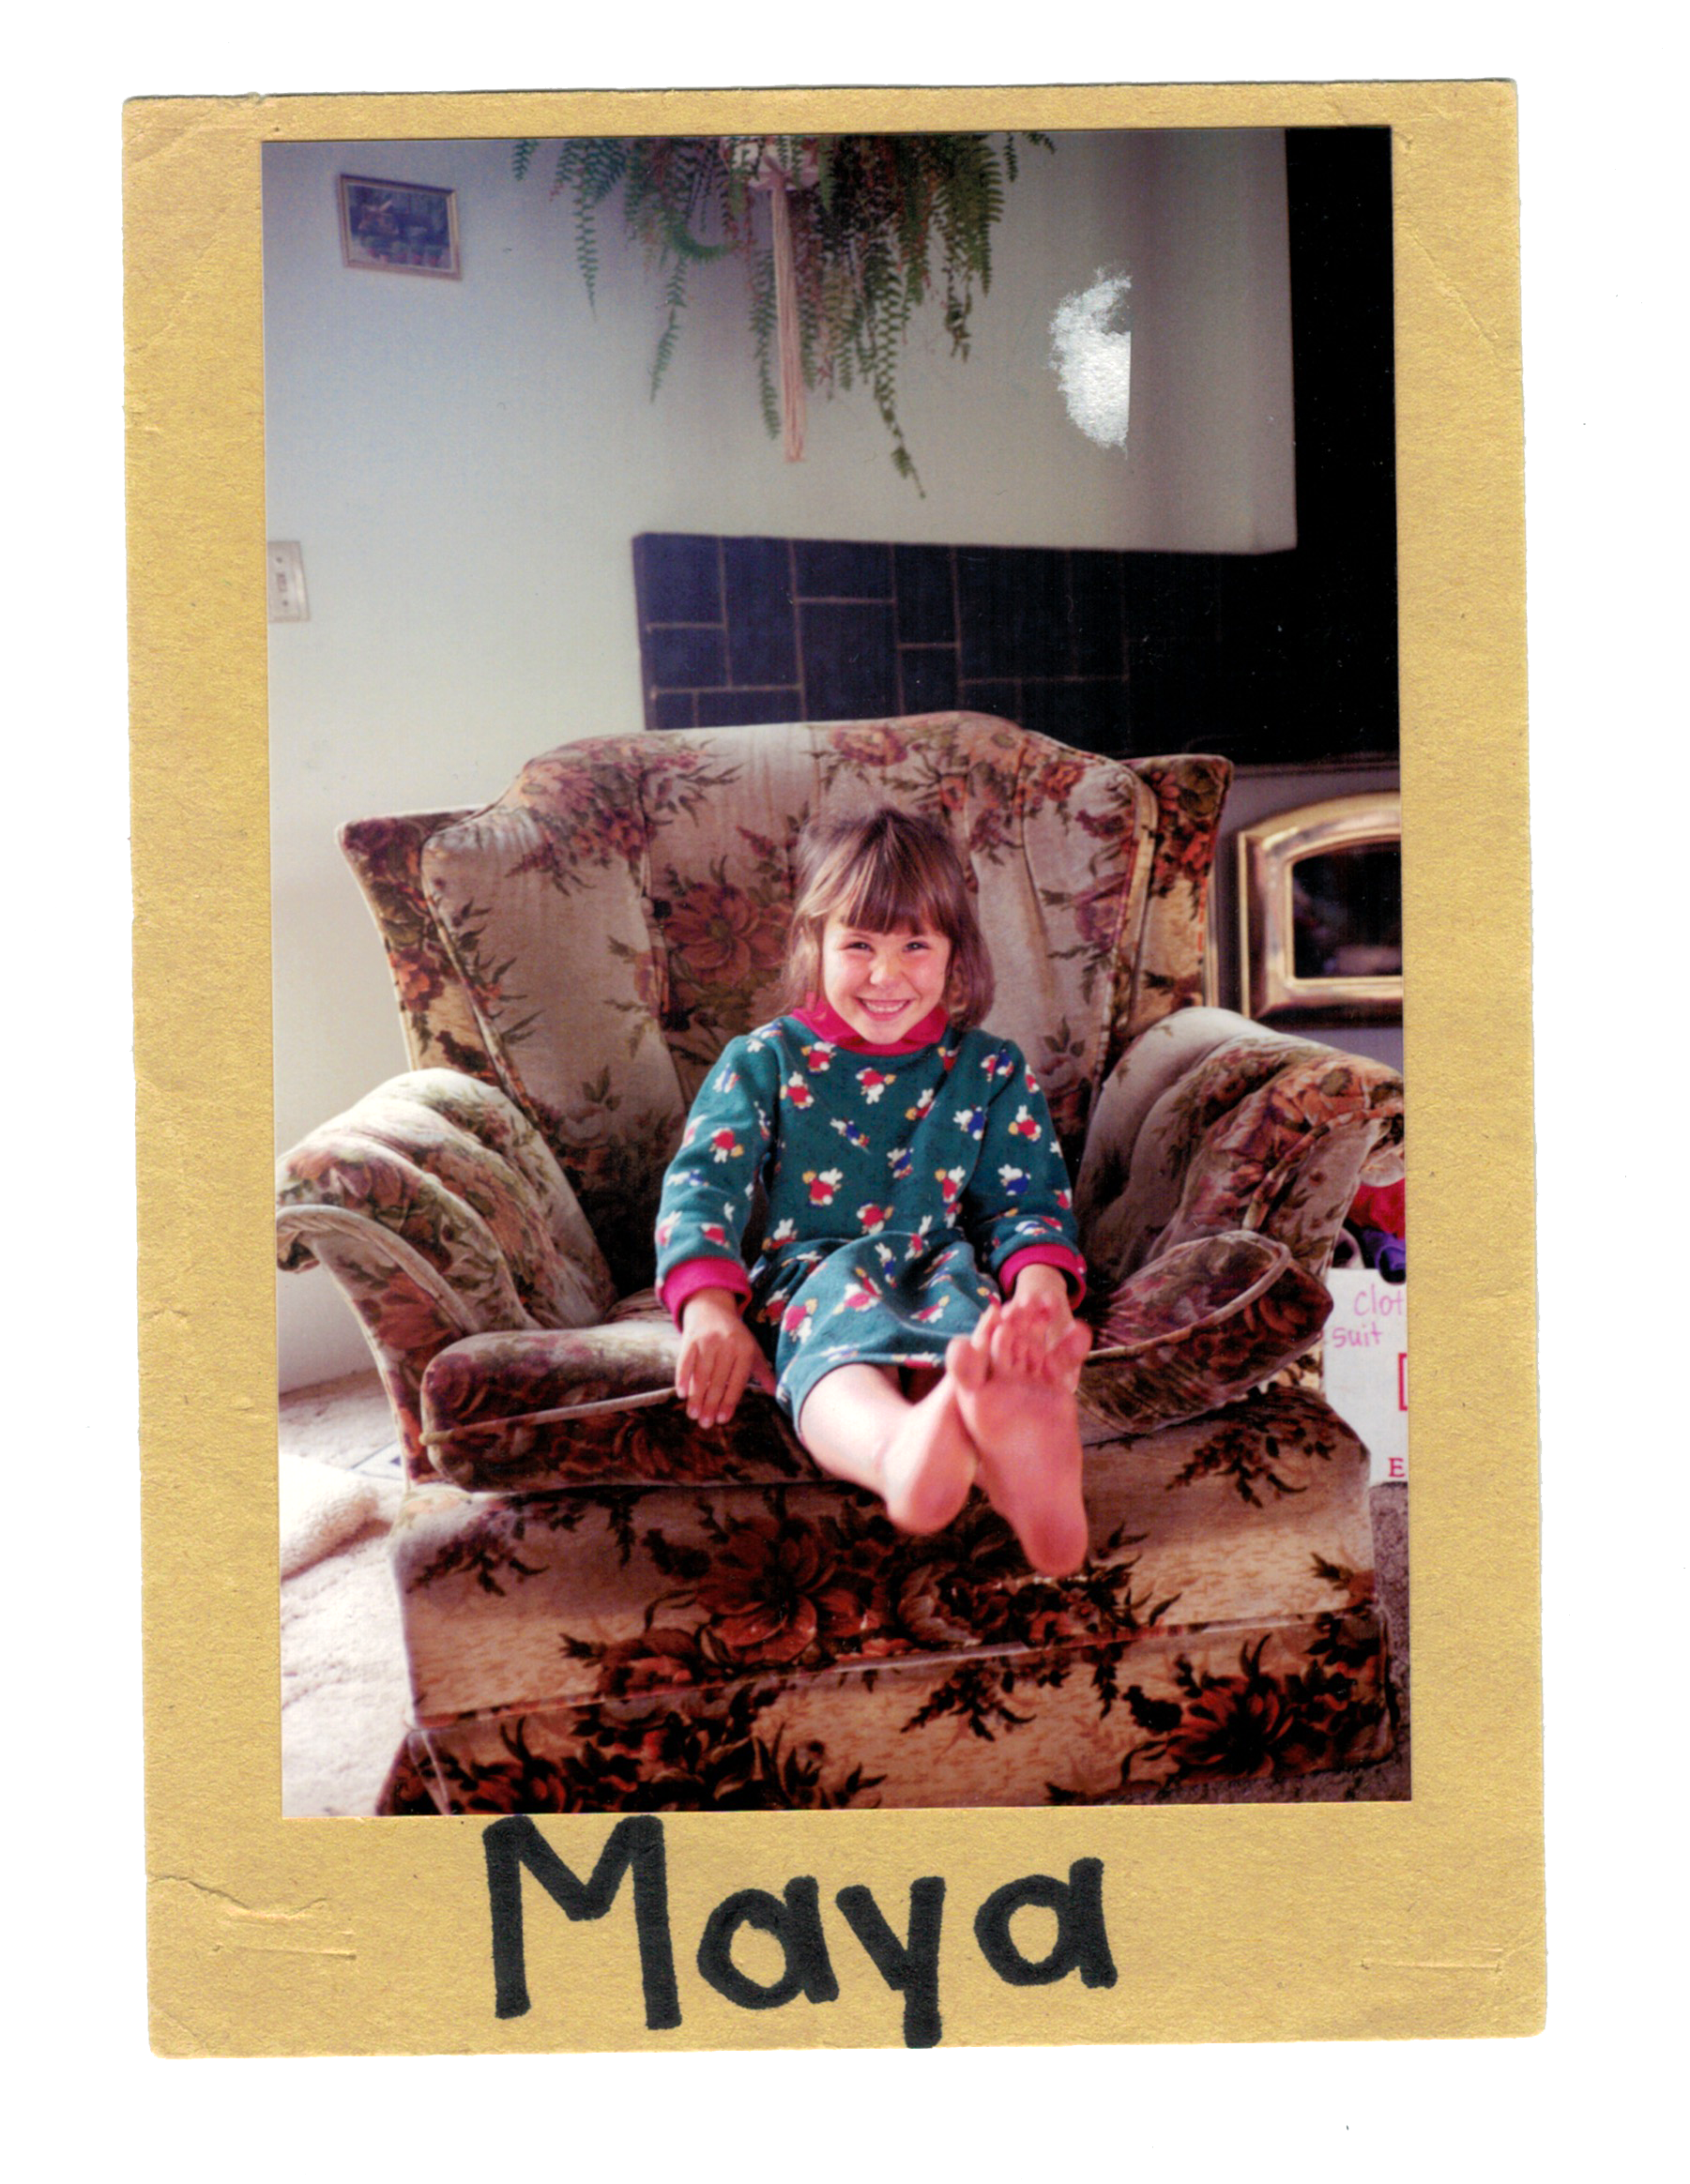 maya_6_p n g.png